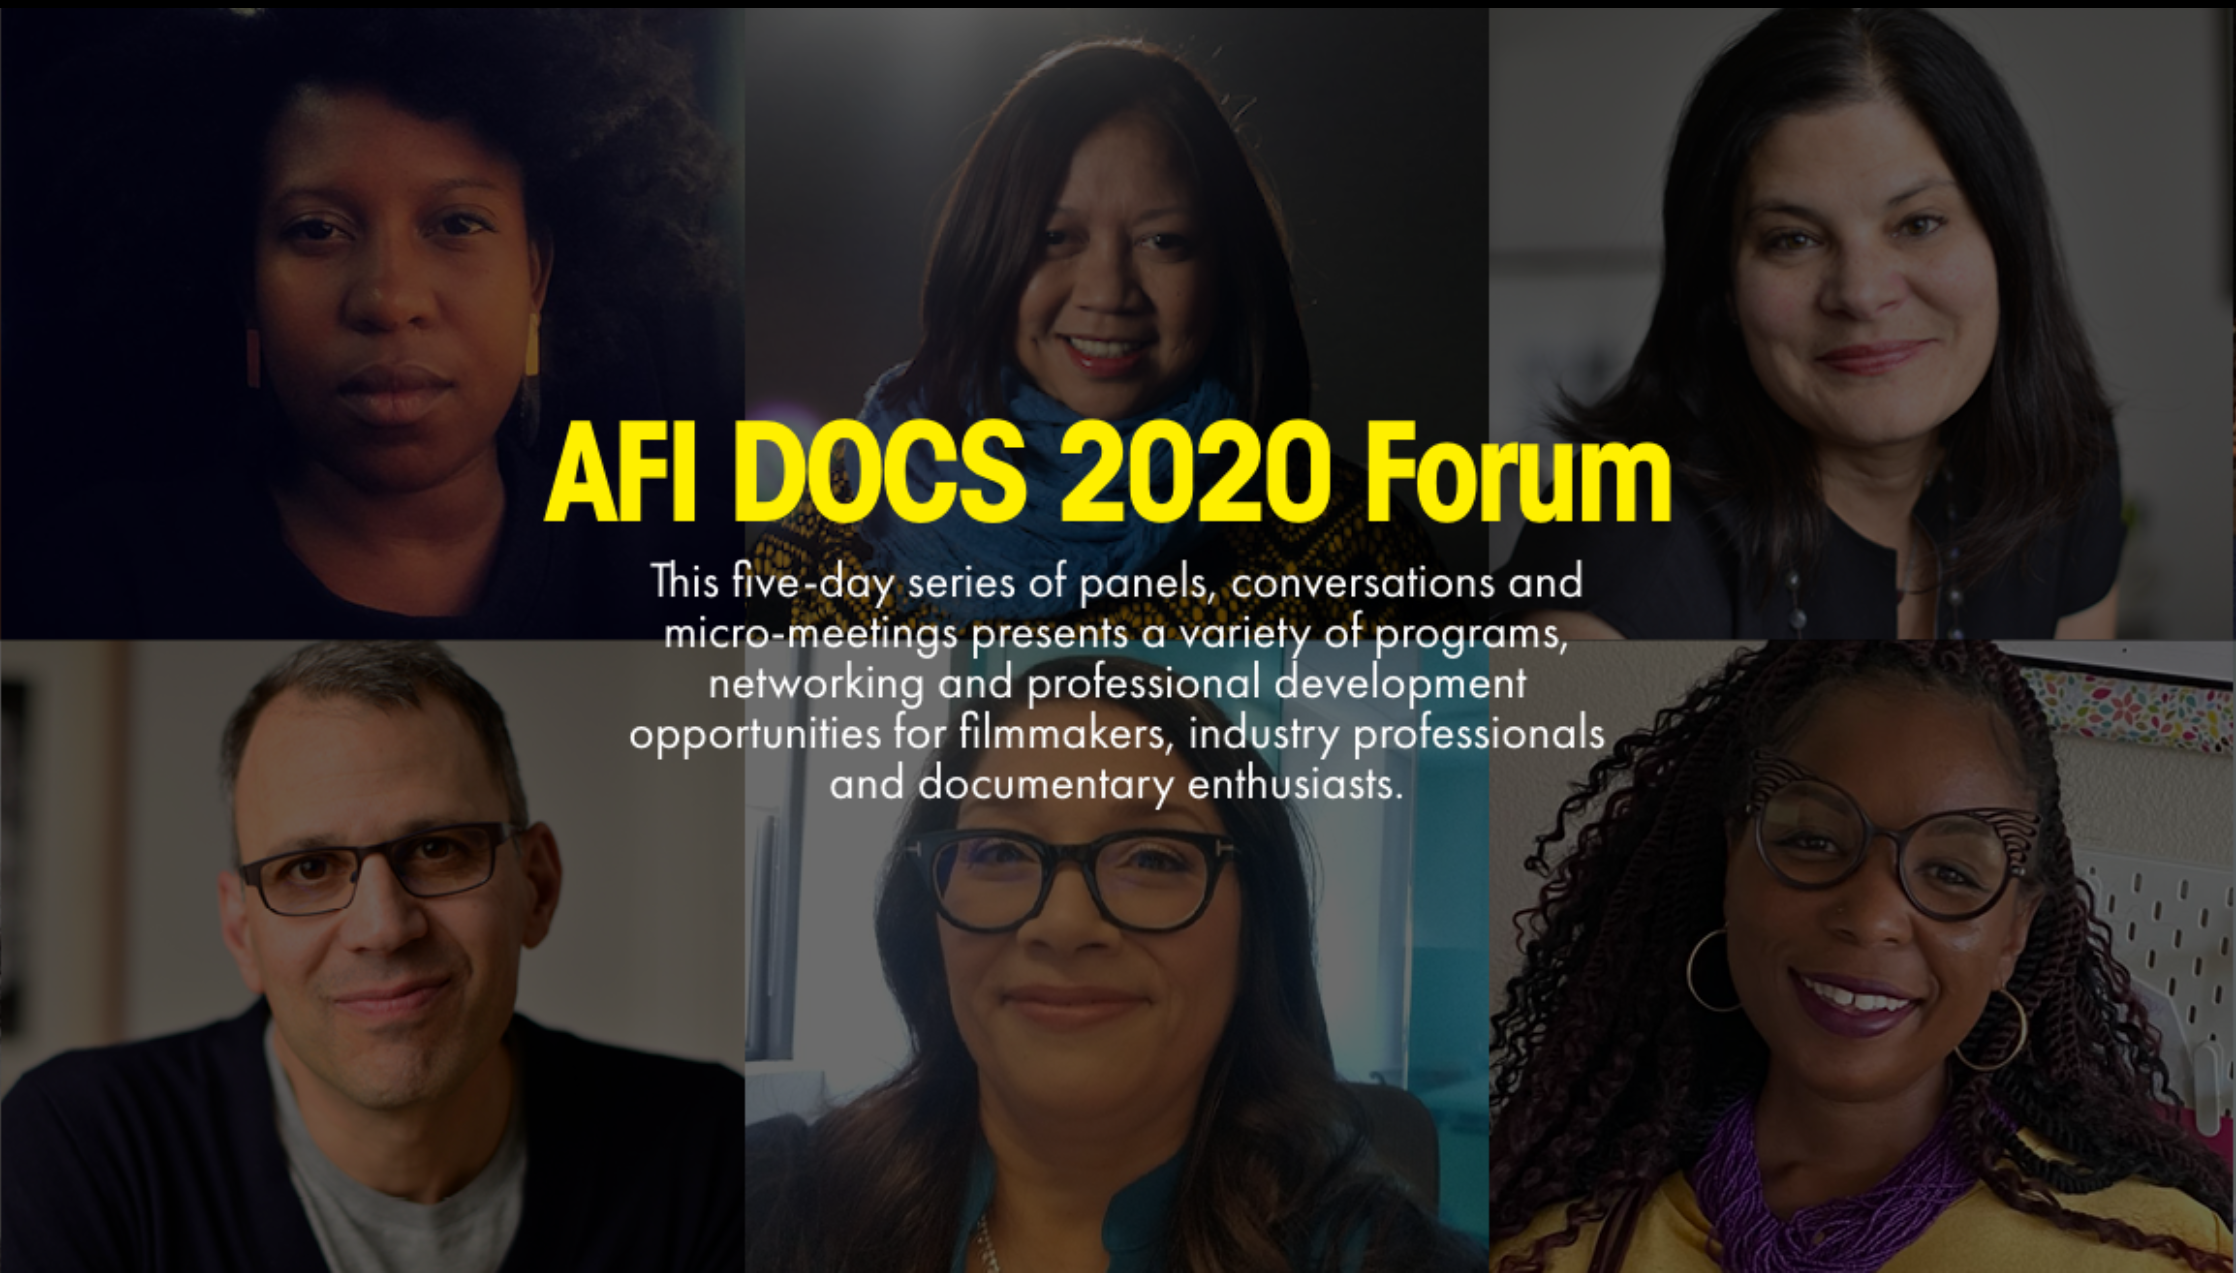 AFI DOCS 2020 FORUM